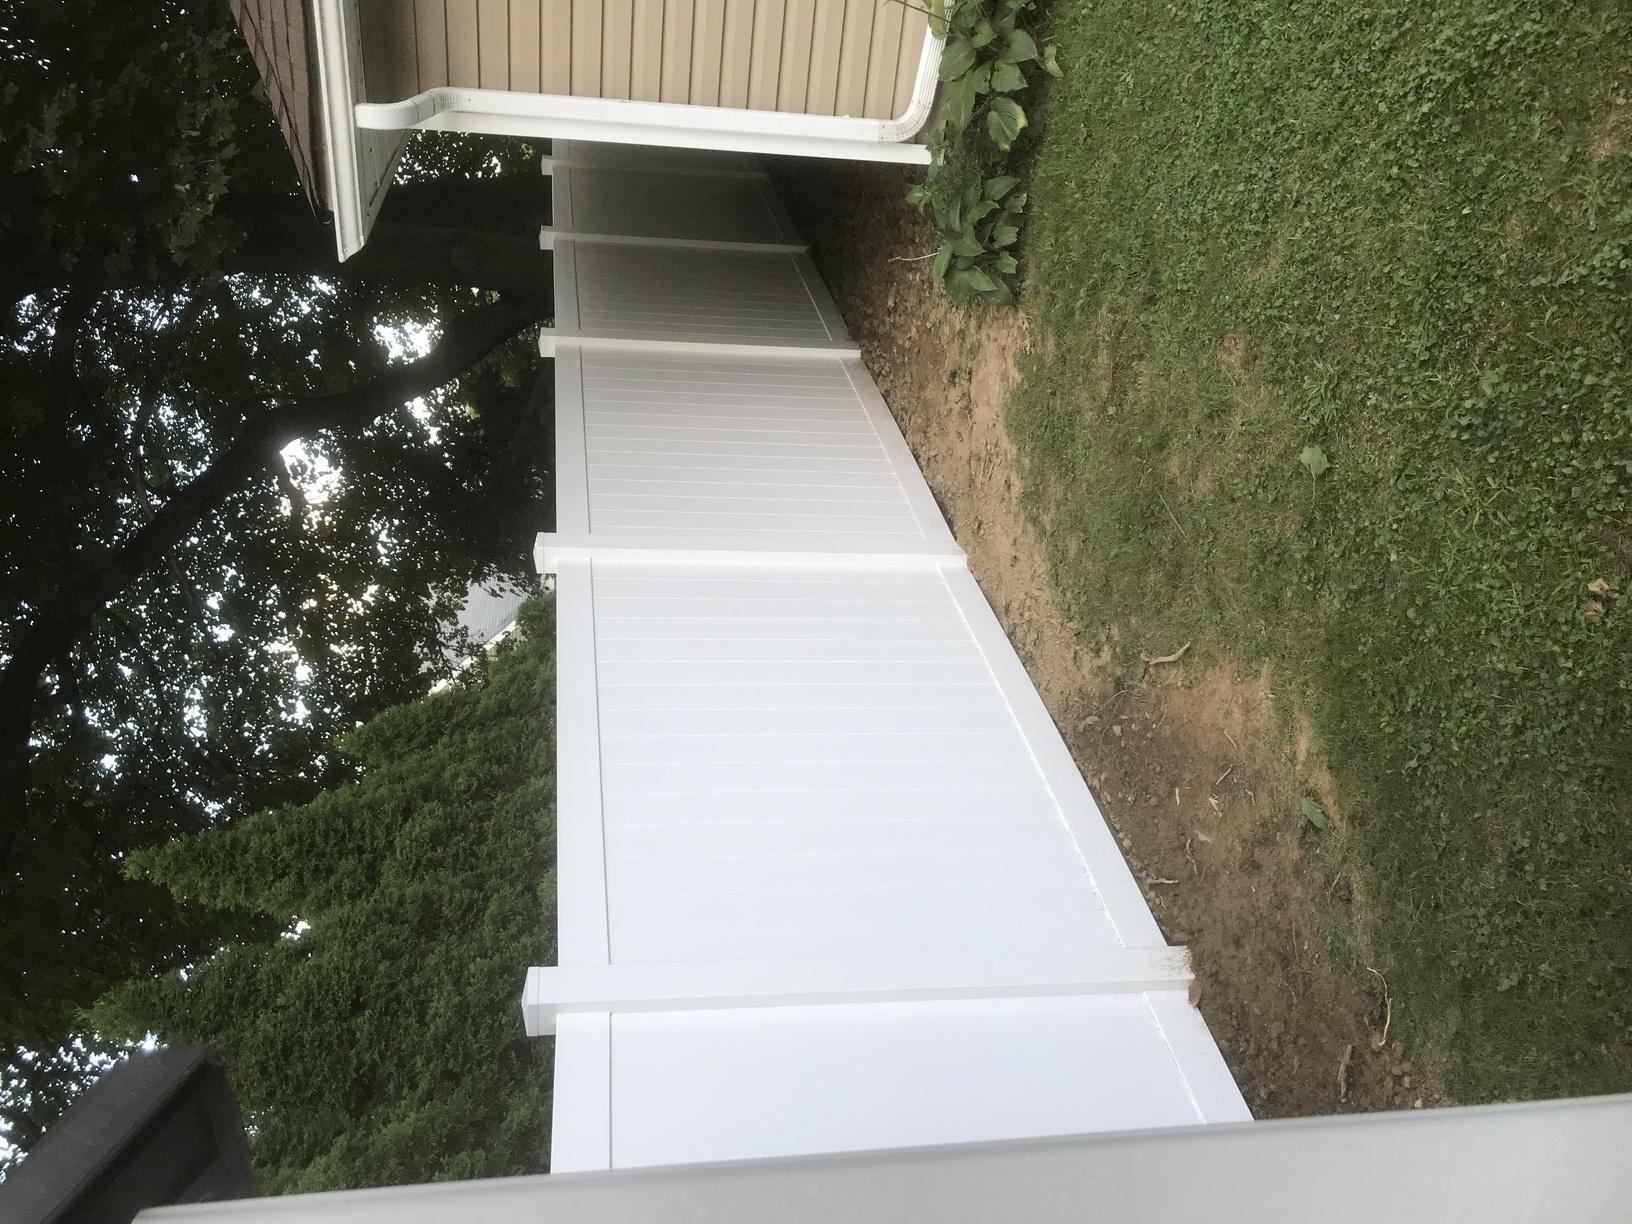 6' Acadia white vinyl privacy fence in Freedom